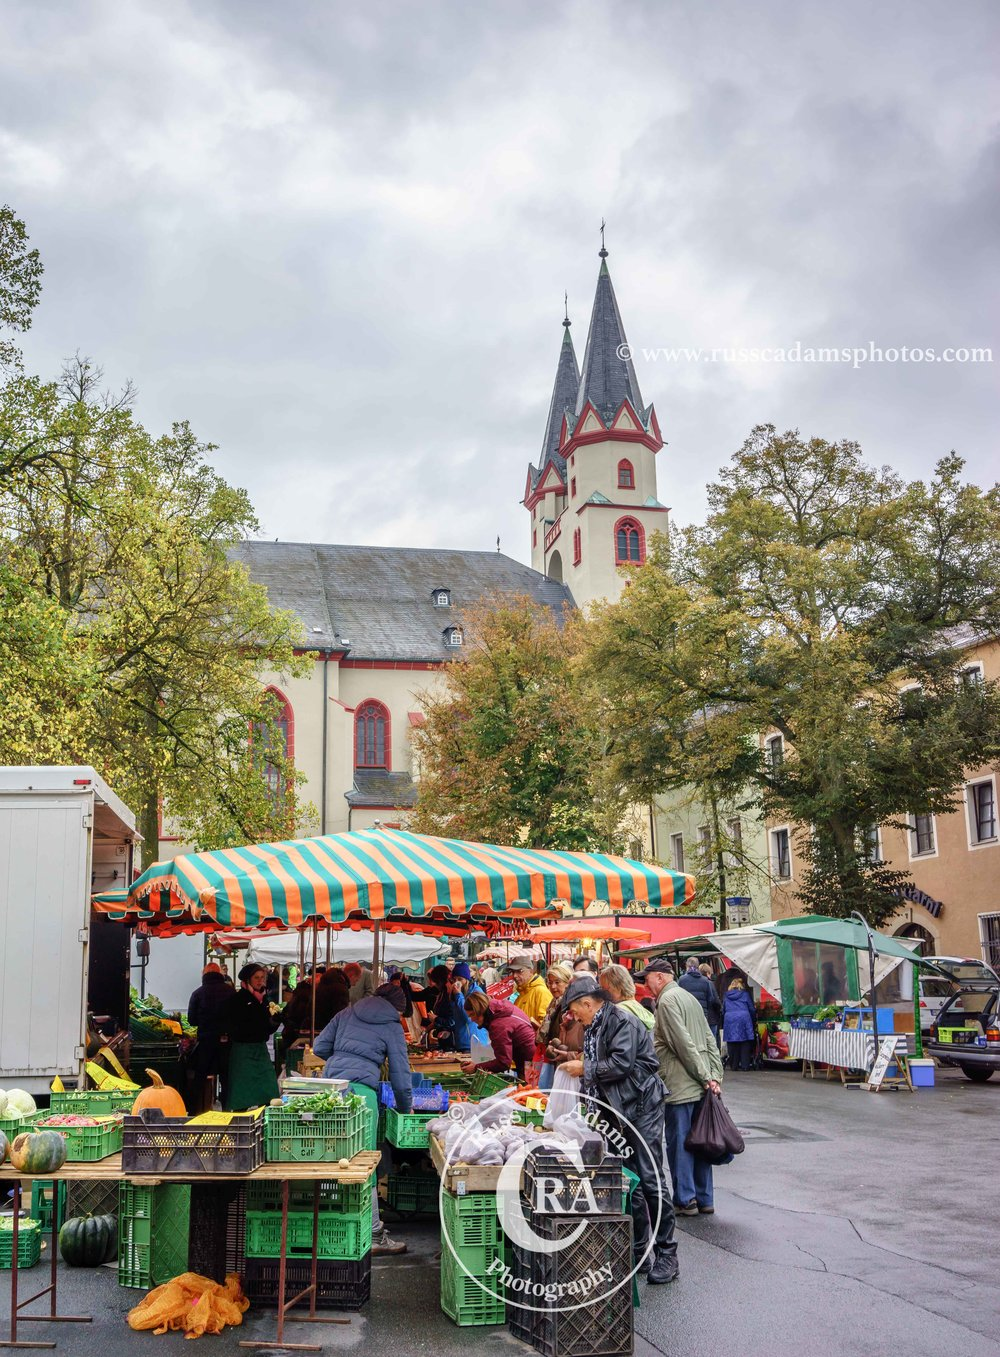 Samstag-Markt-16.jpg